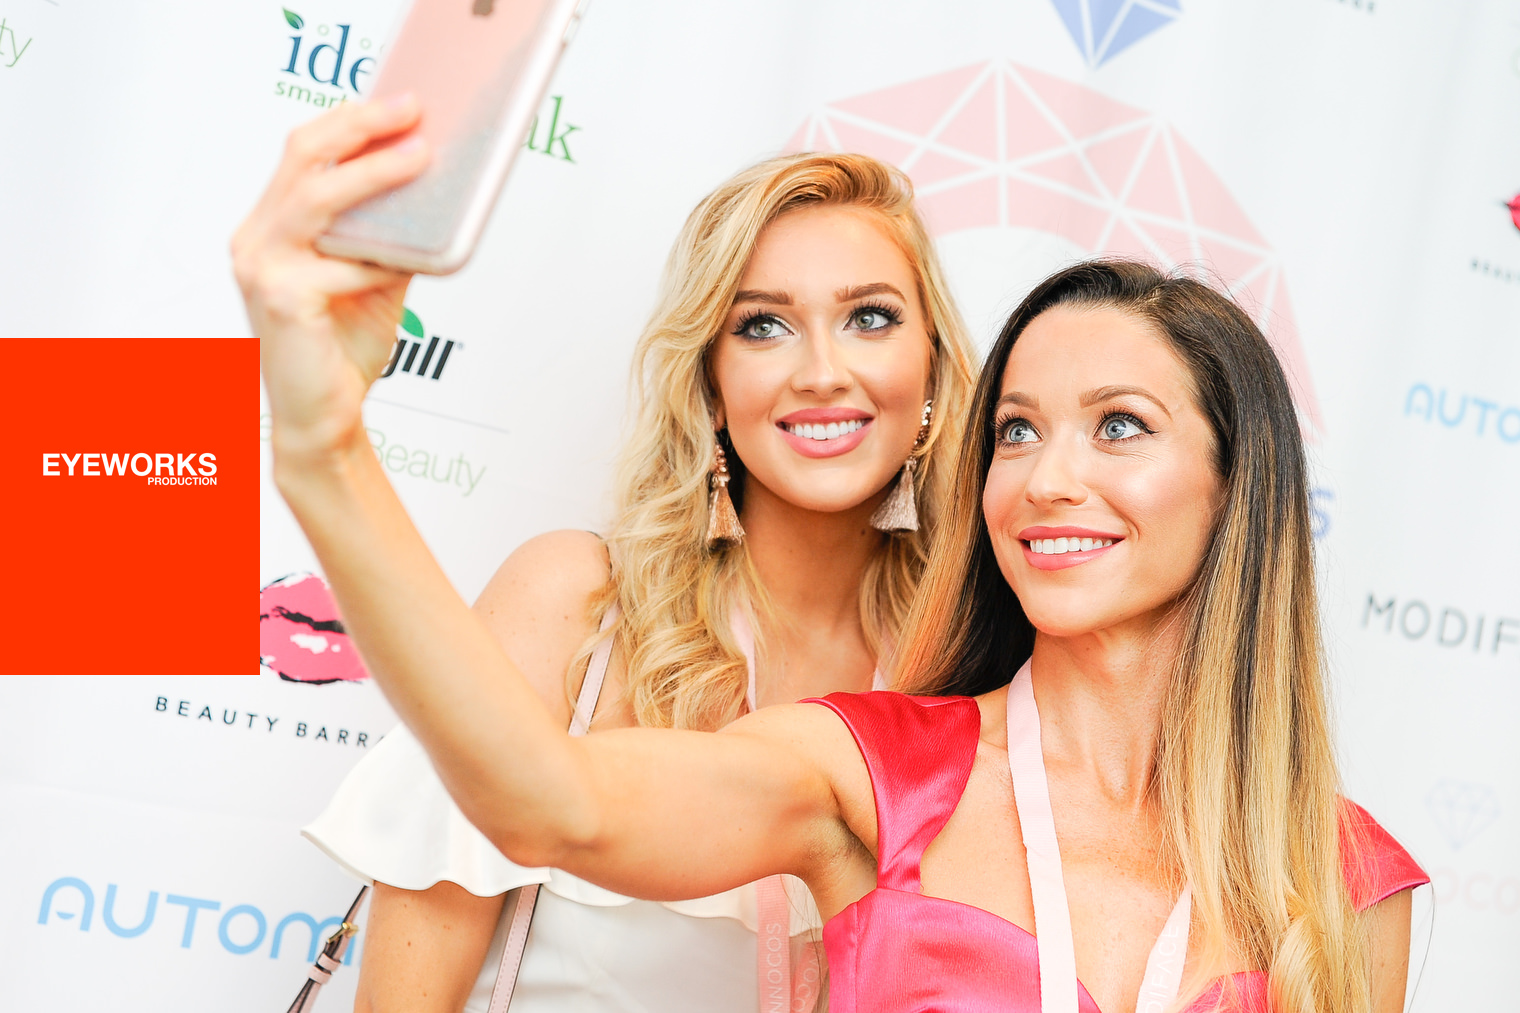 INNOCOS Summit #beauty20 Awards SLS Miami Beach by Sergi Alexander.